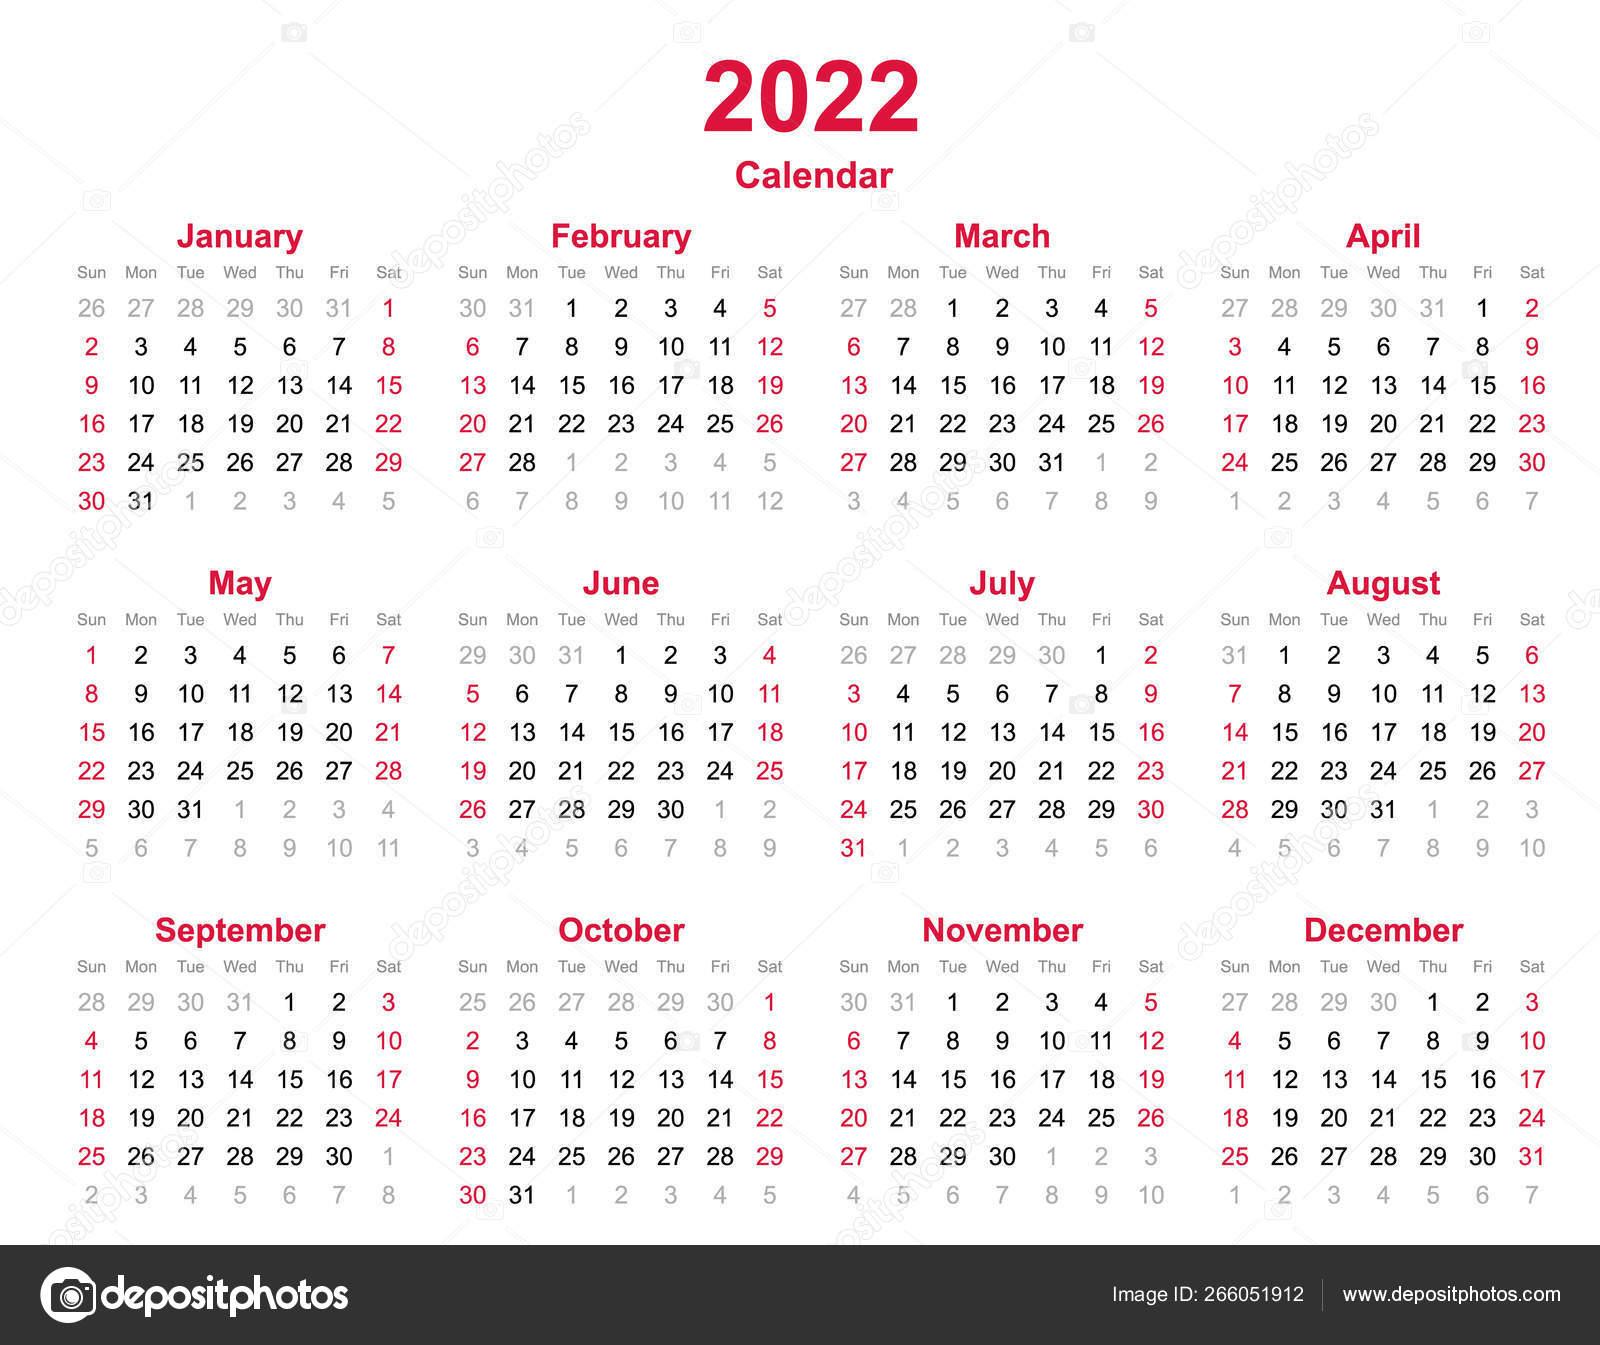 2022 Calendar Months.2022 Yearly Calendar Months Yearly Calendar Set 2022 Calendar Template Vector Image By C Khamhoung Vector Stock 266051912